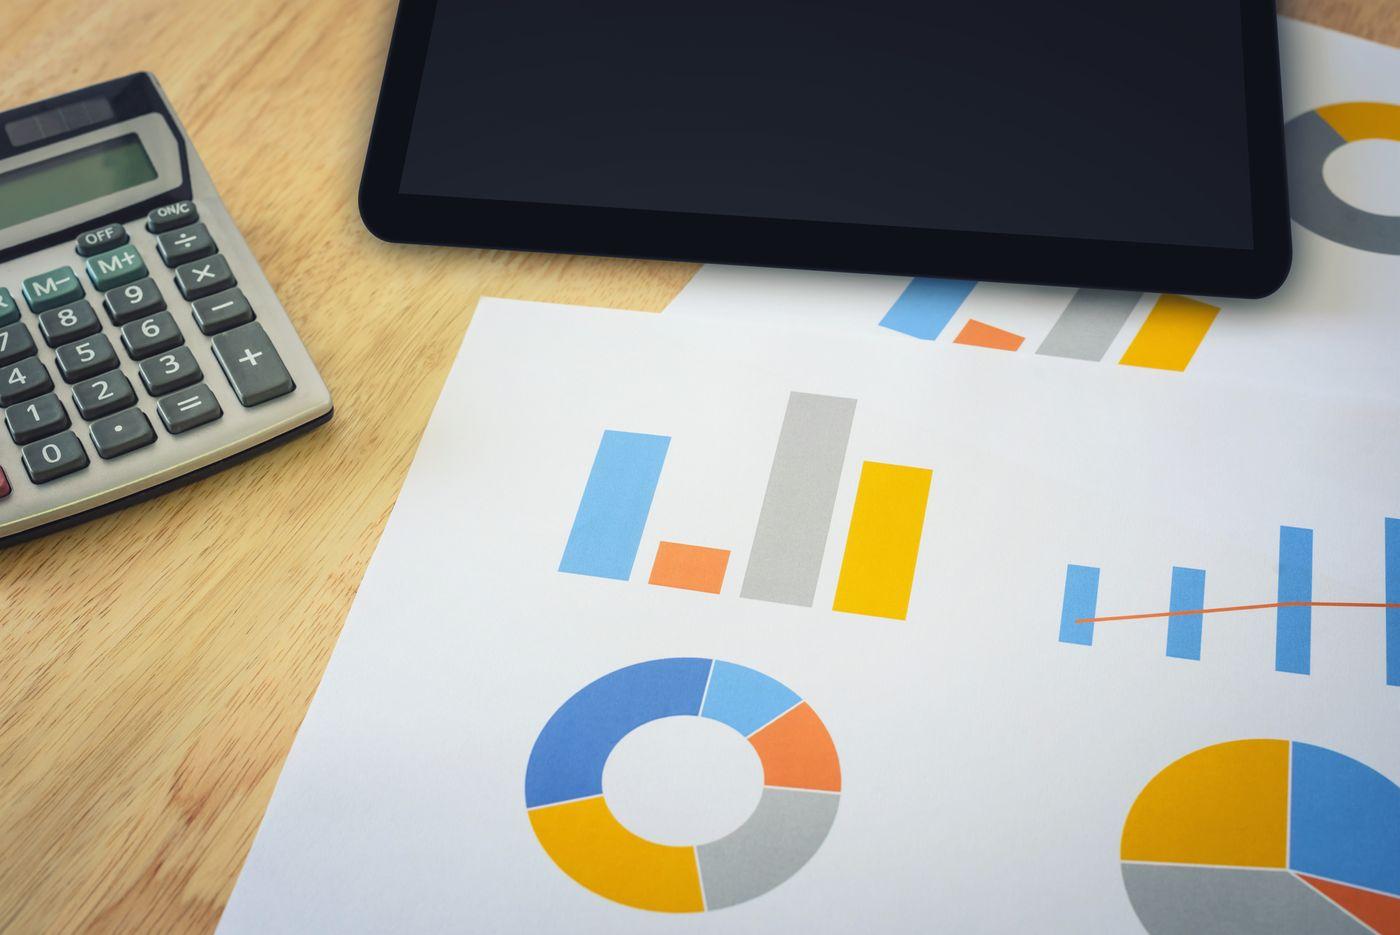 financial-chart-with-calculator-and-digital-tablet-K4JPG8C.jpg